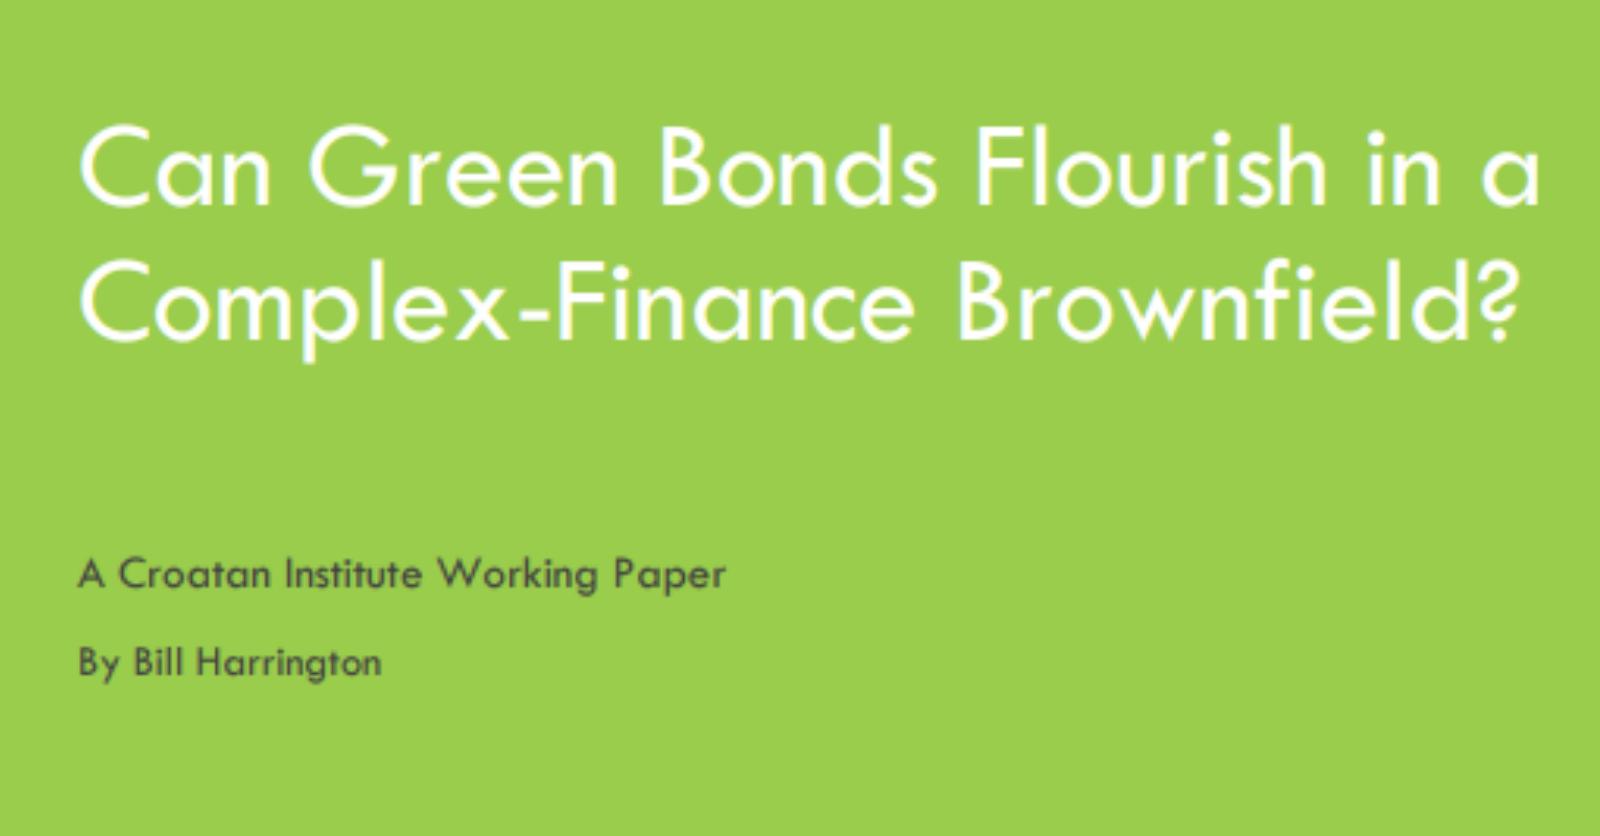 Can Green Bonds Flourish in a Complex-Finance Brownfield?